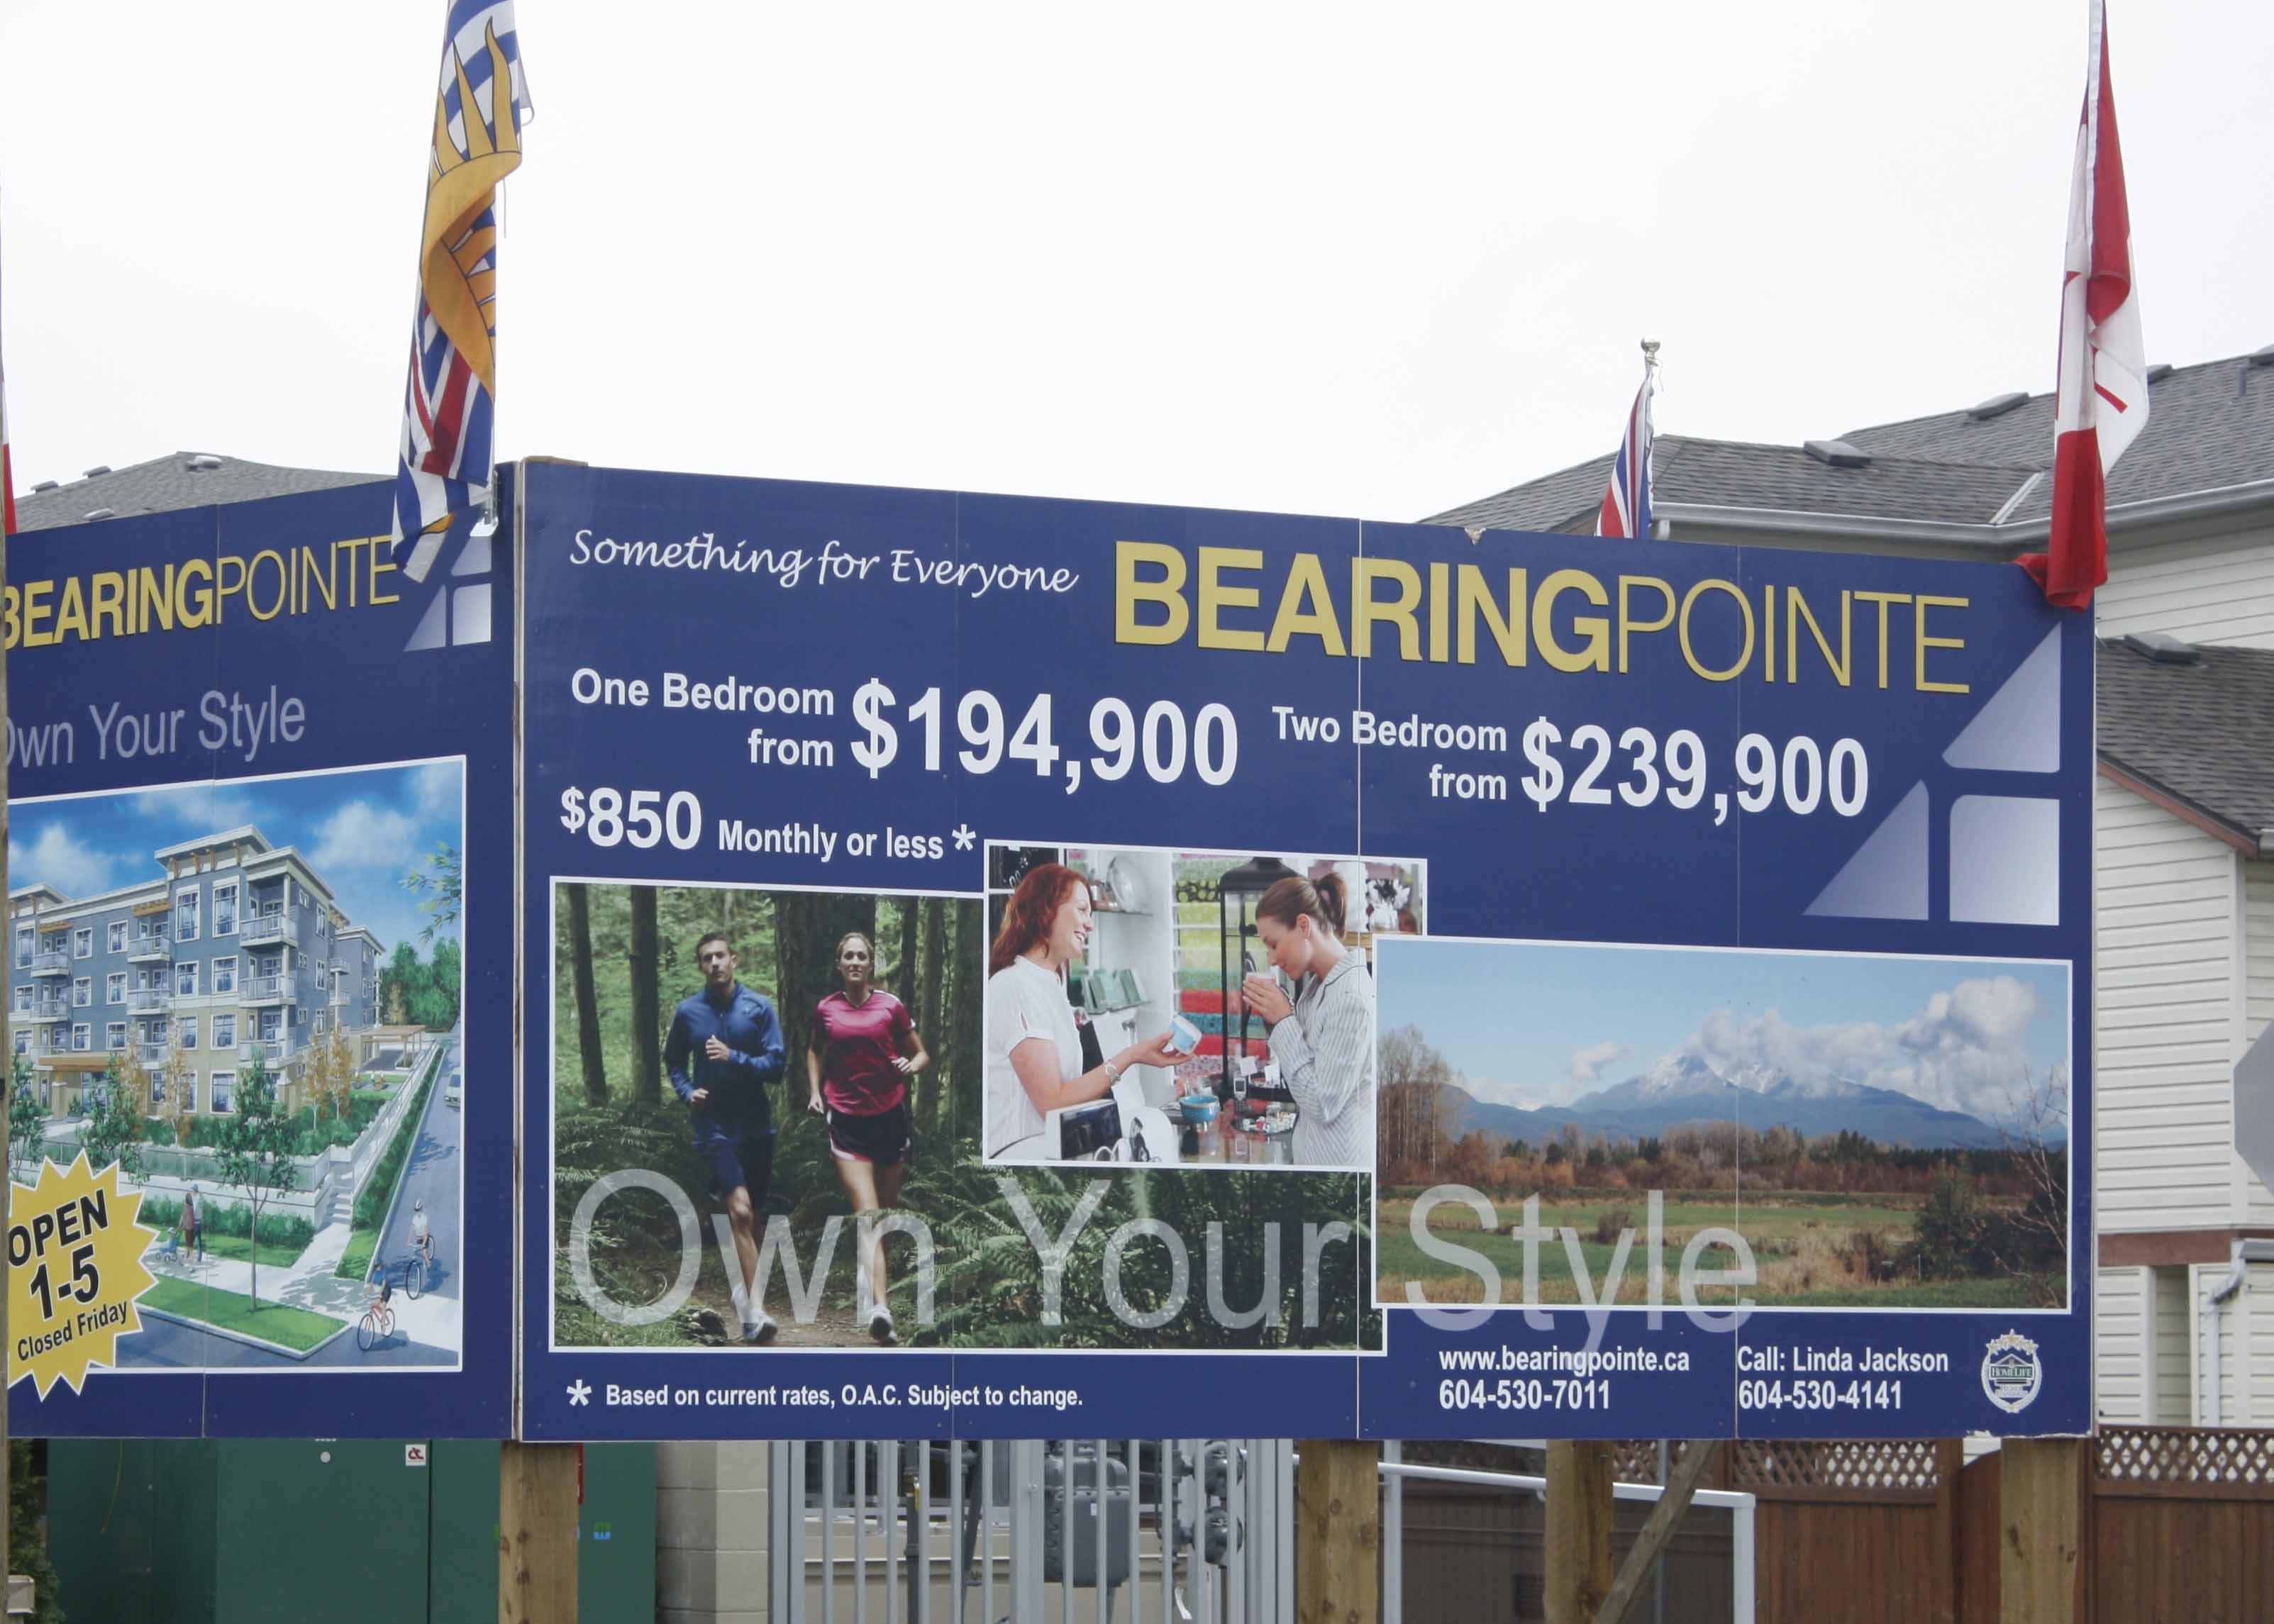 Bearing Pointe billboards